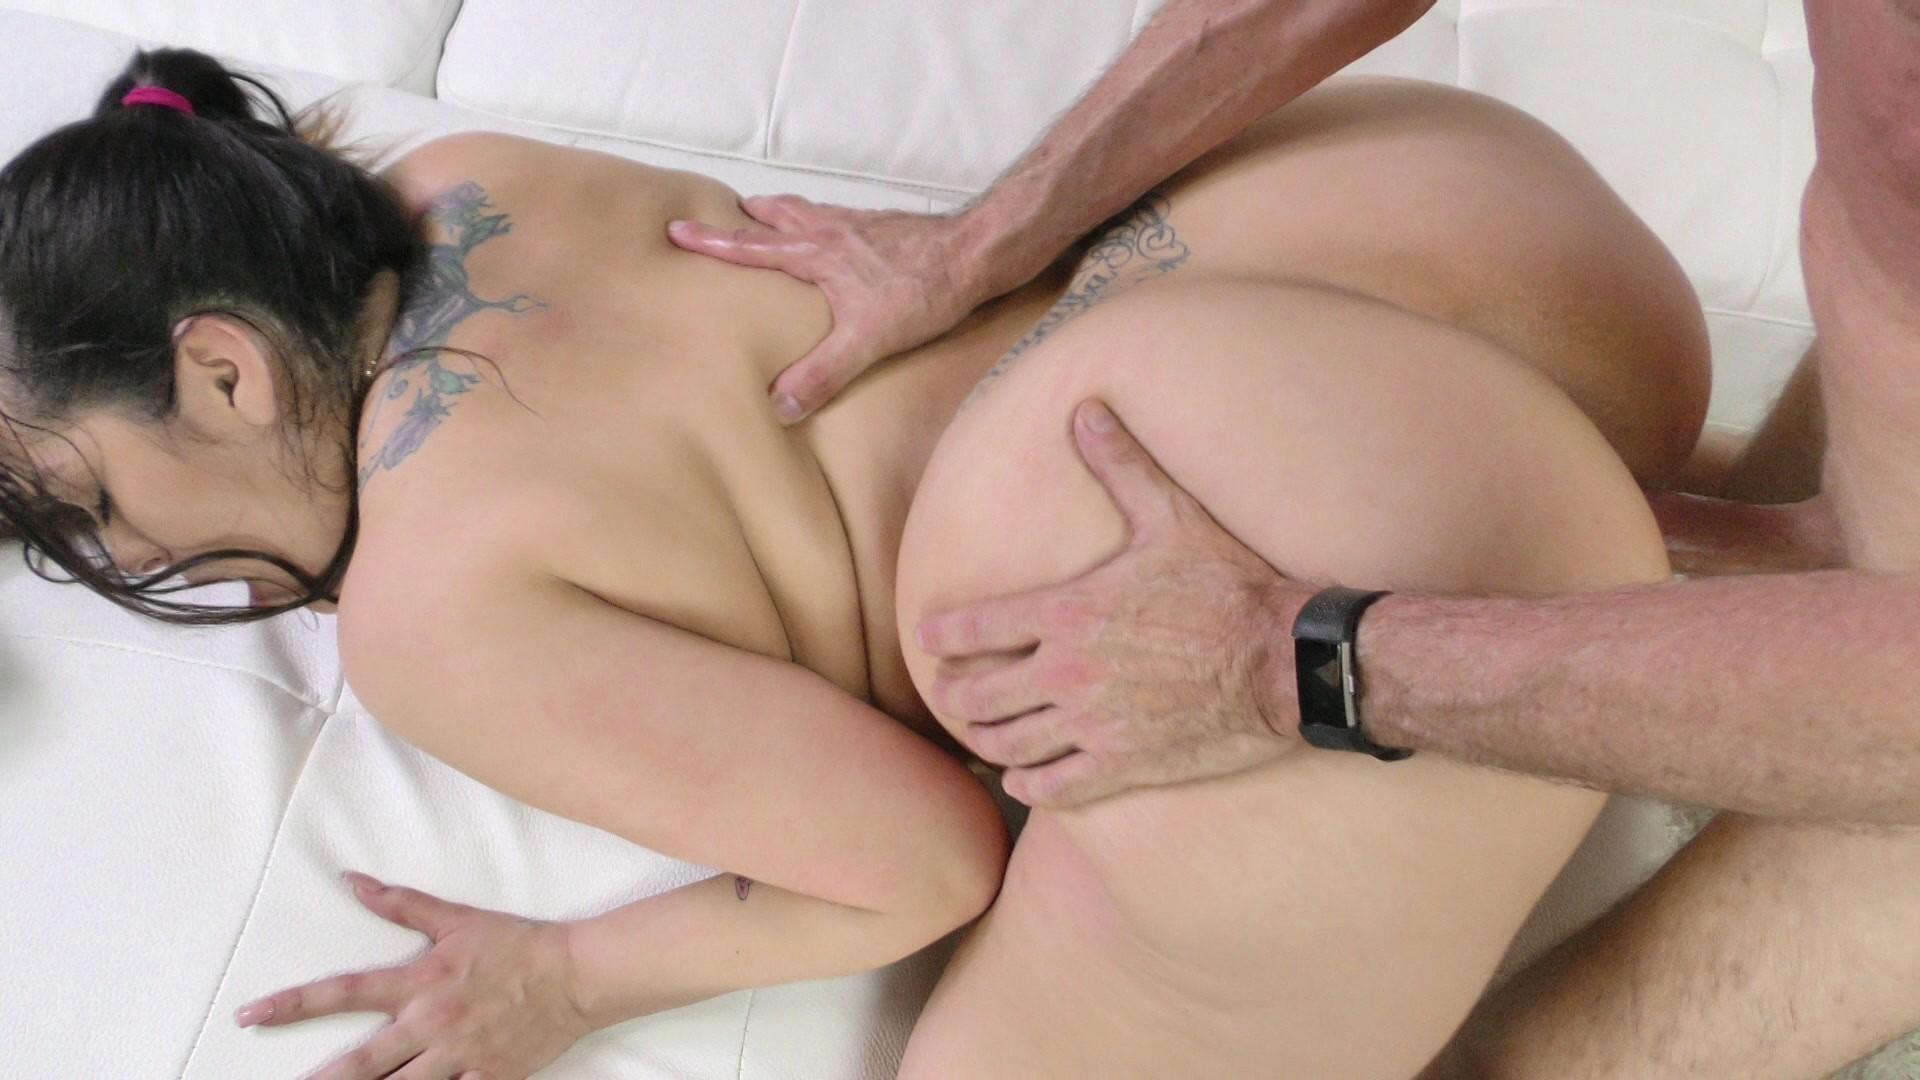 Alicia Starr Gets Her Big Butt Massaged  Glazed With Warm -5605